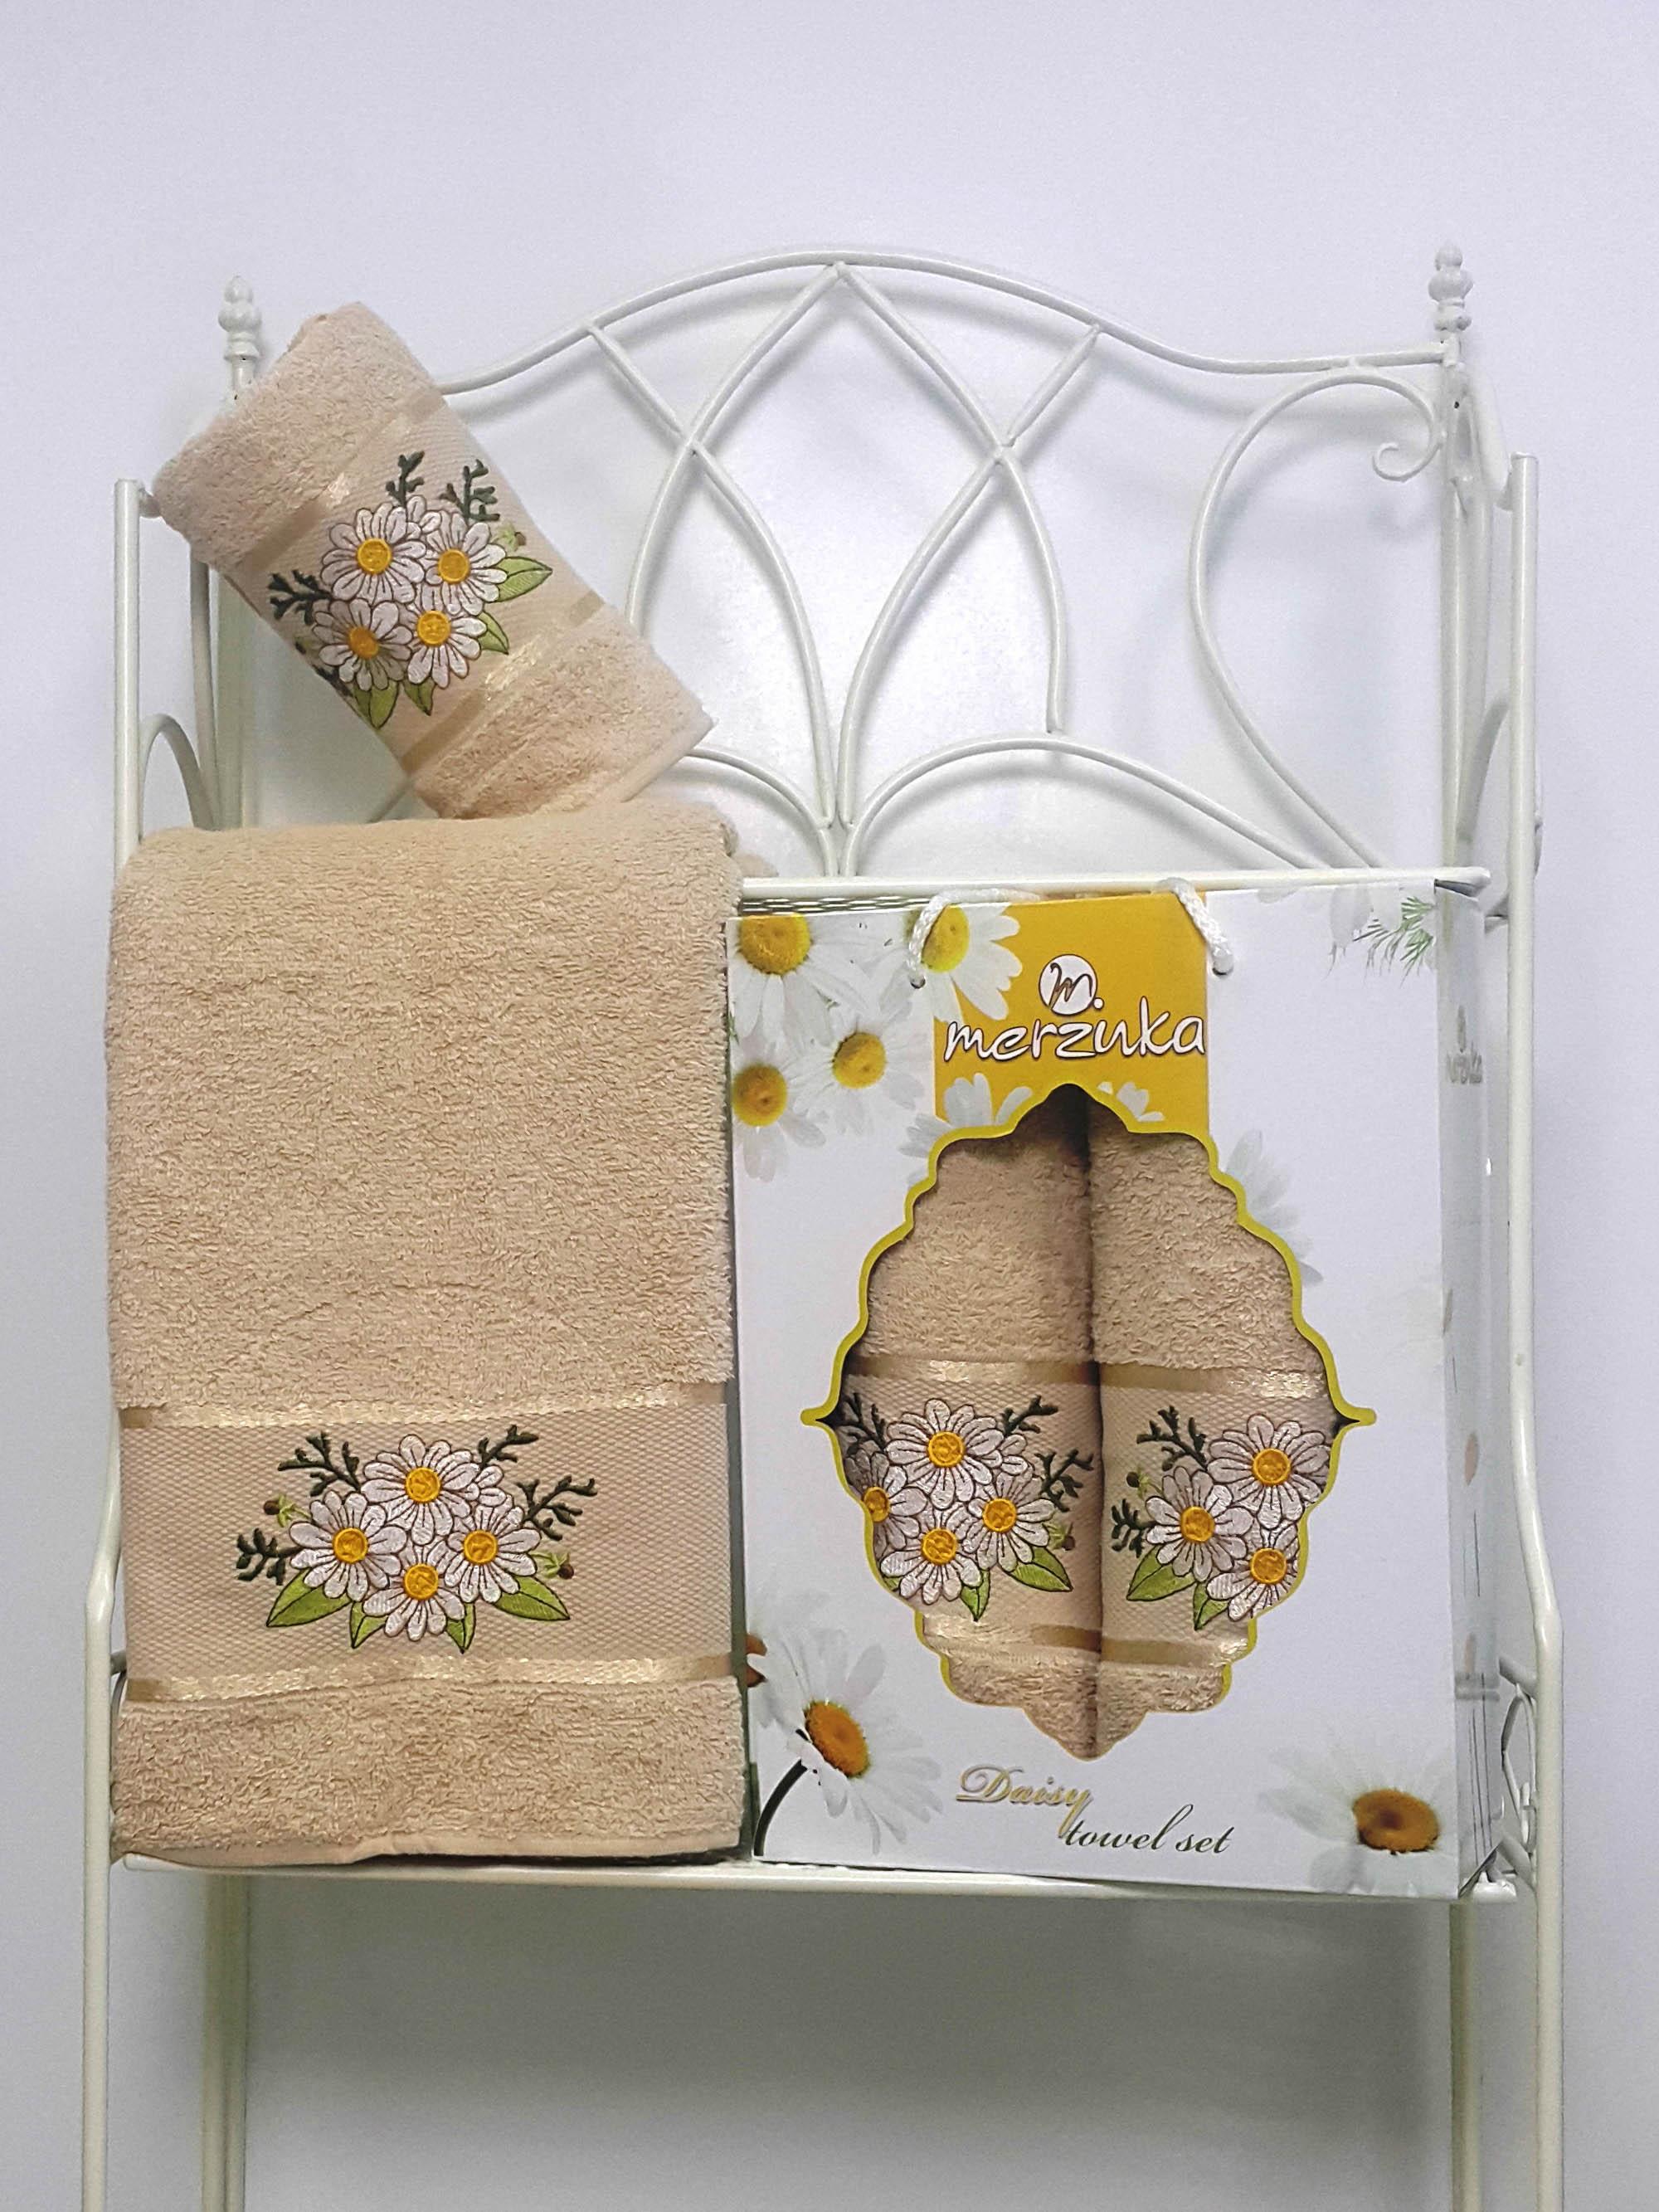 Полотенца Oran Merzuka Набор из 2 полотенец Daisy Цвет: Бежевый набор из 2 полотенец merzuka sakura 50х90 70х140 8430 кремовый